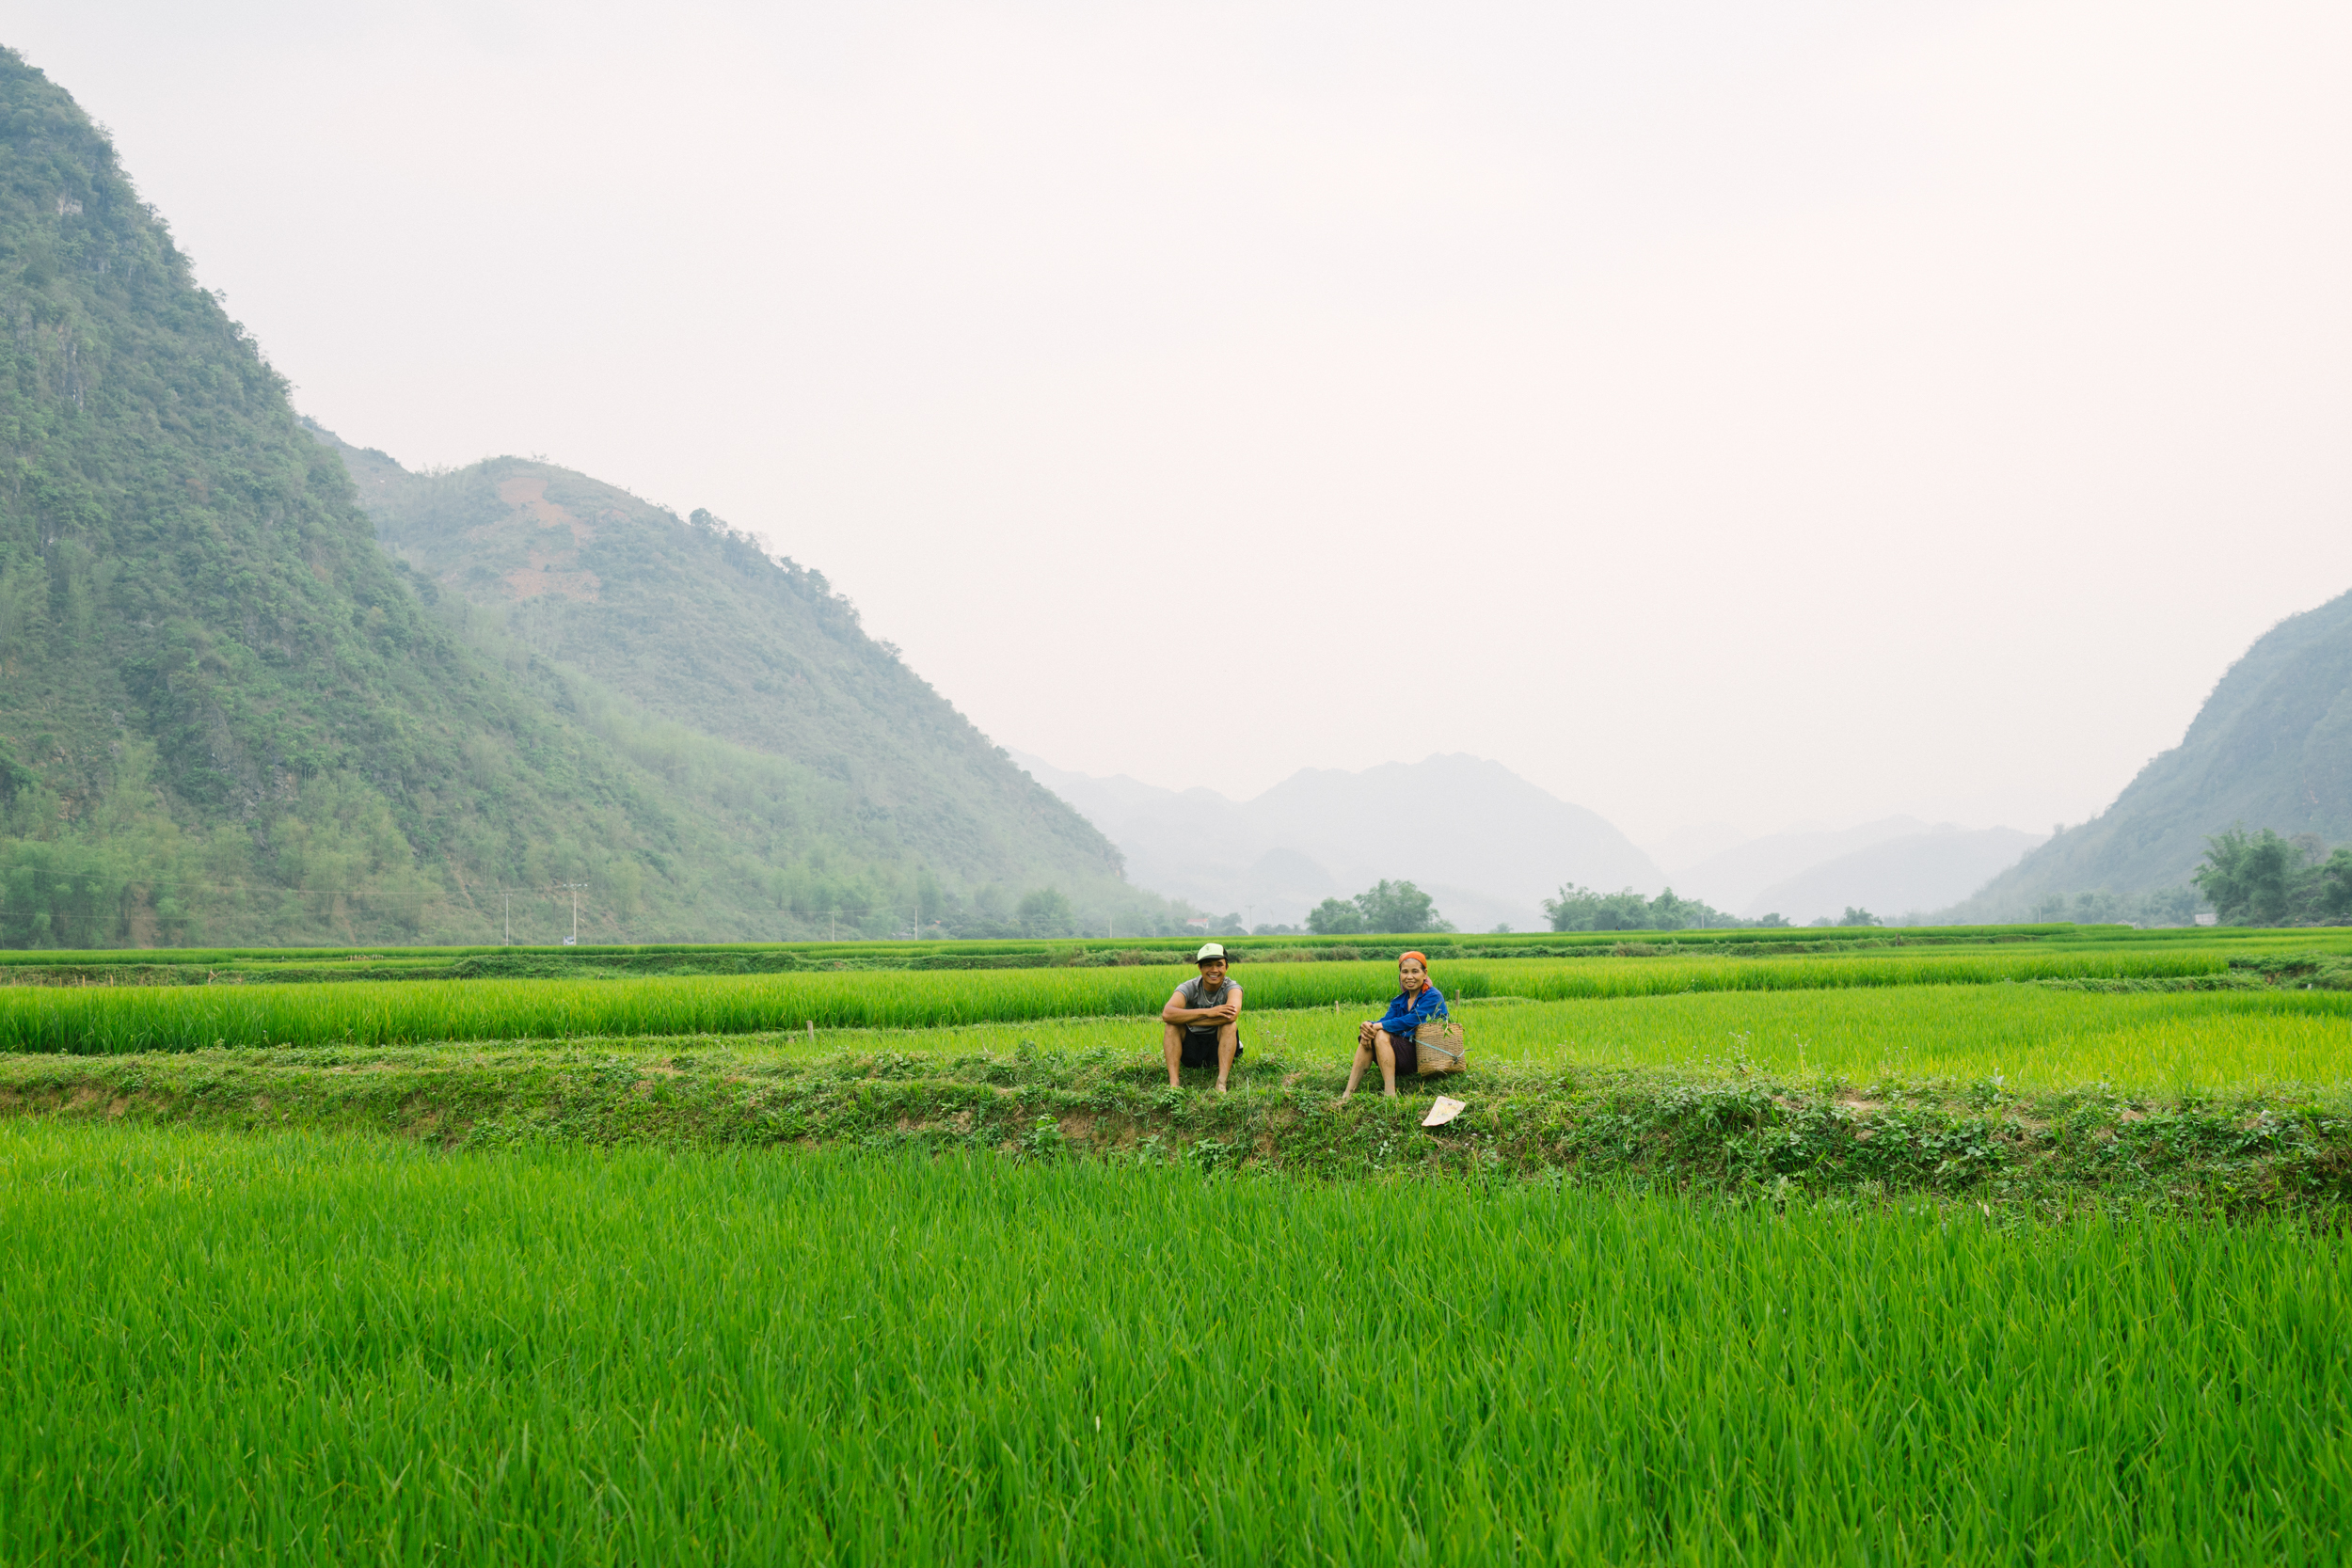 vietnam-project-apr-2015_0126.jpg